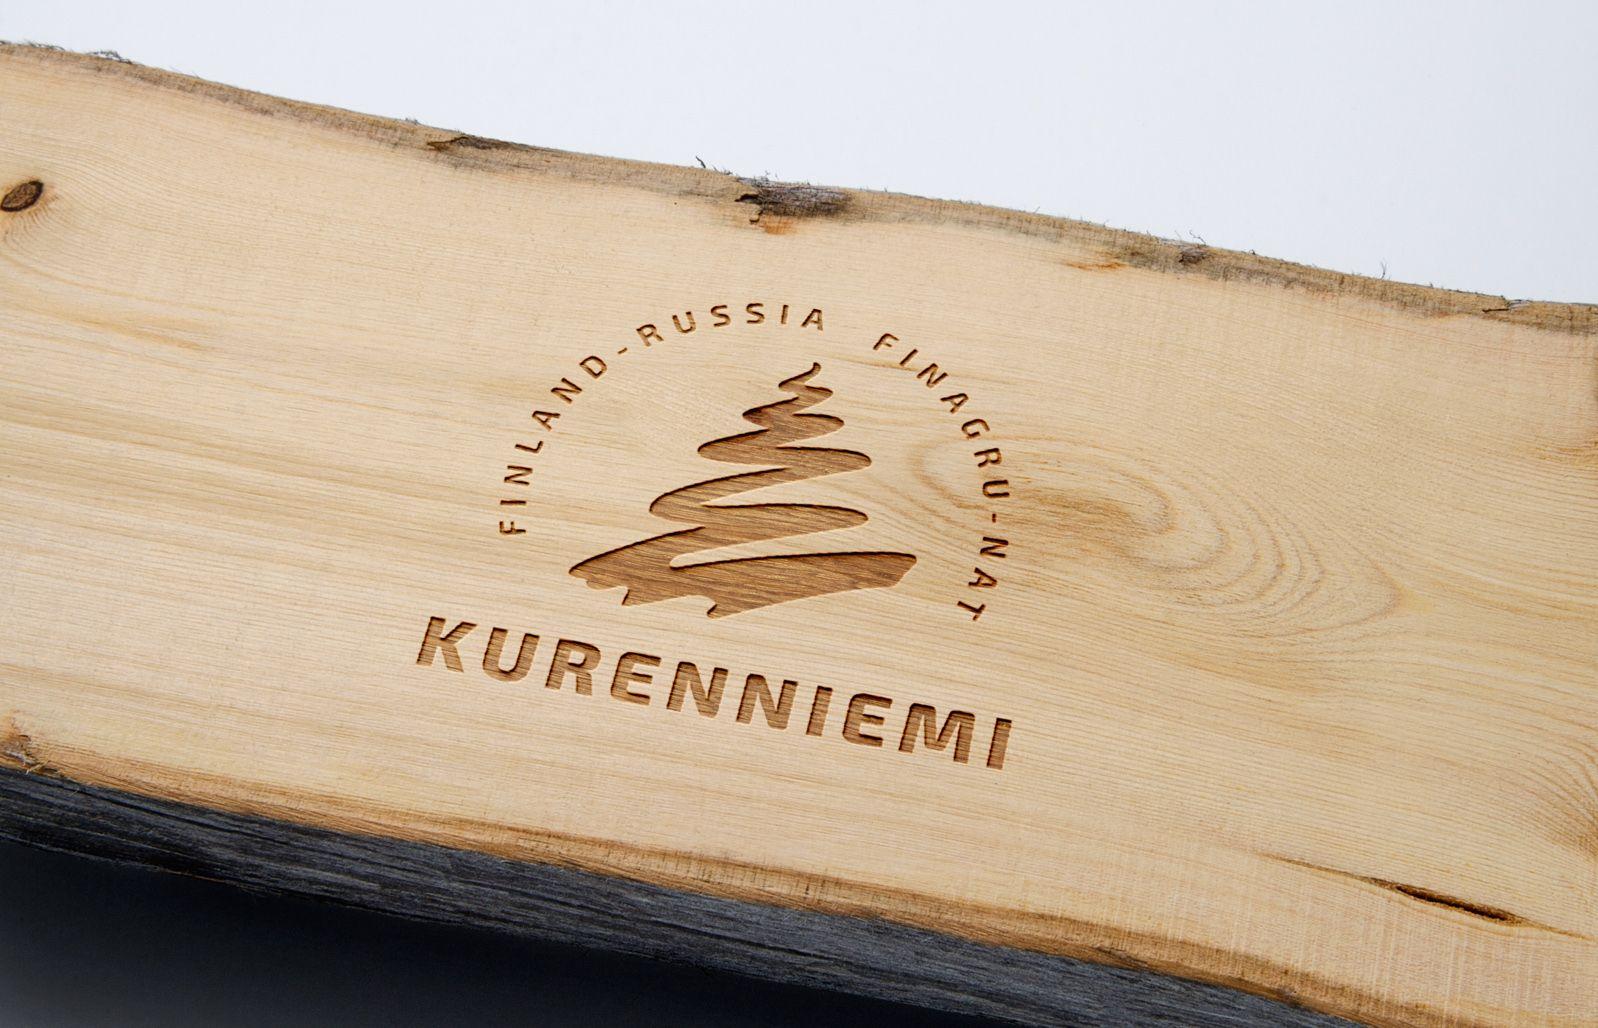 Логотип для Kurenniemi, FinAgRu-nat, Finland-Russia - дизайнер andblin61